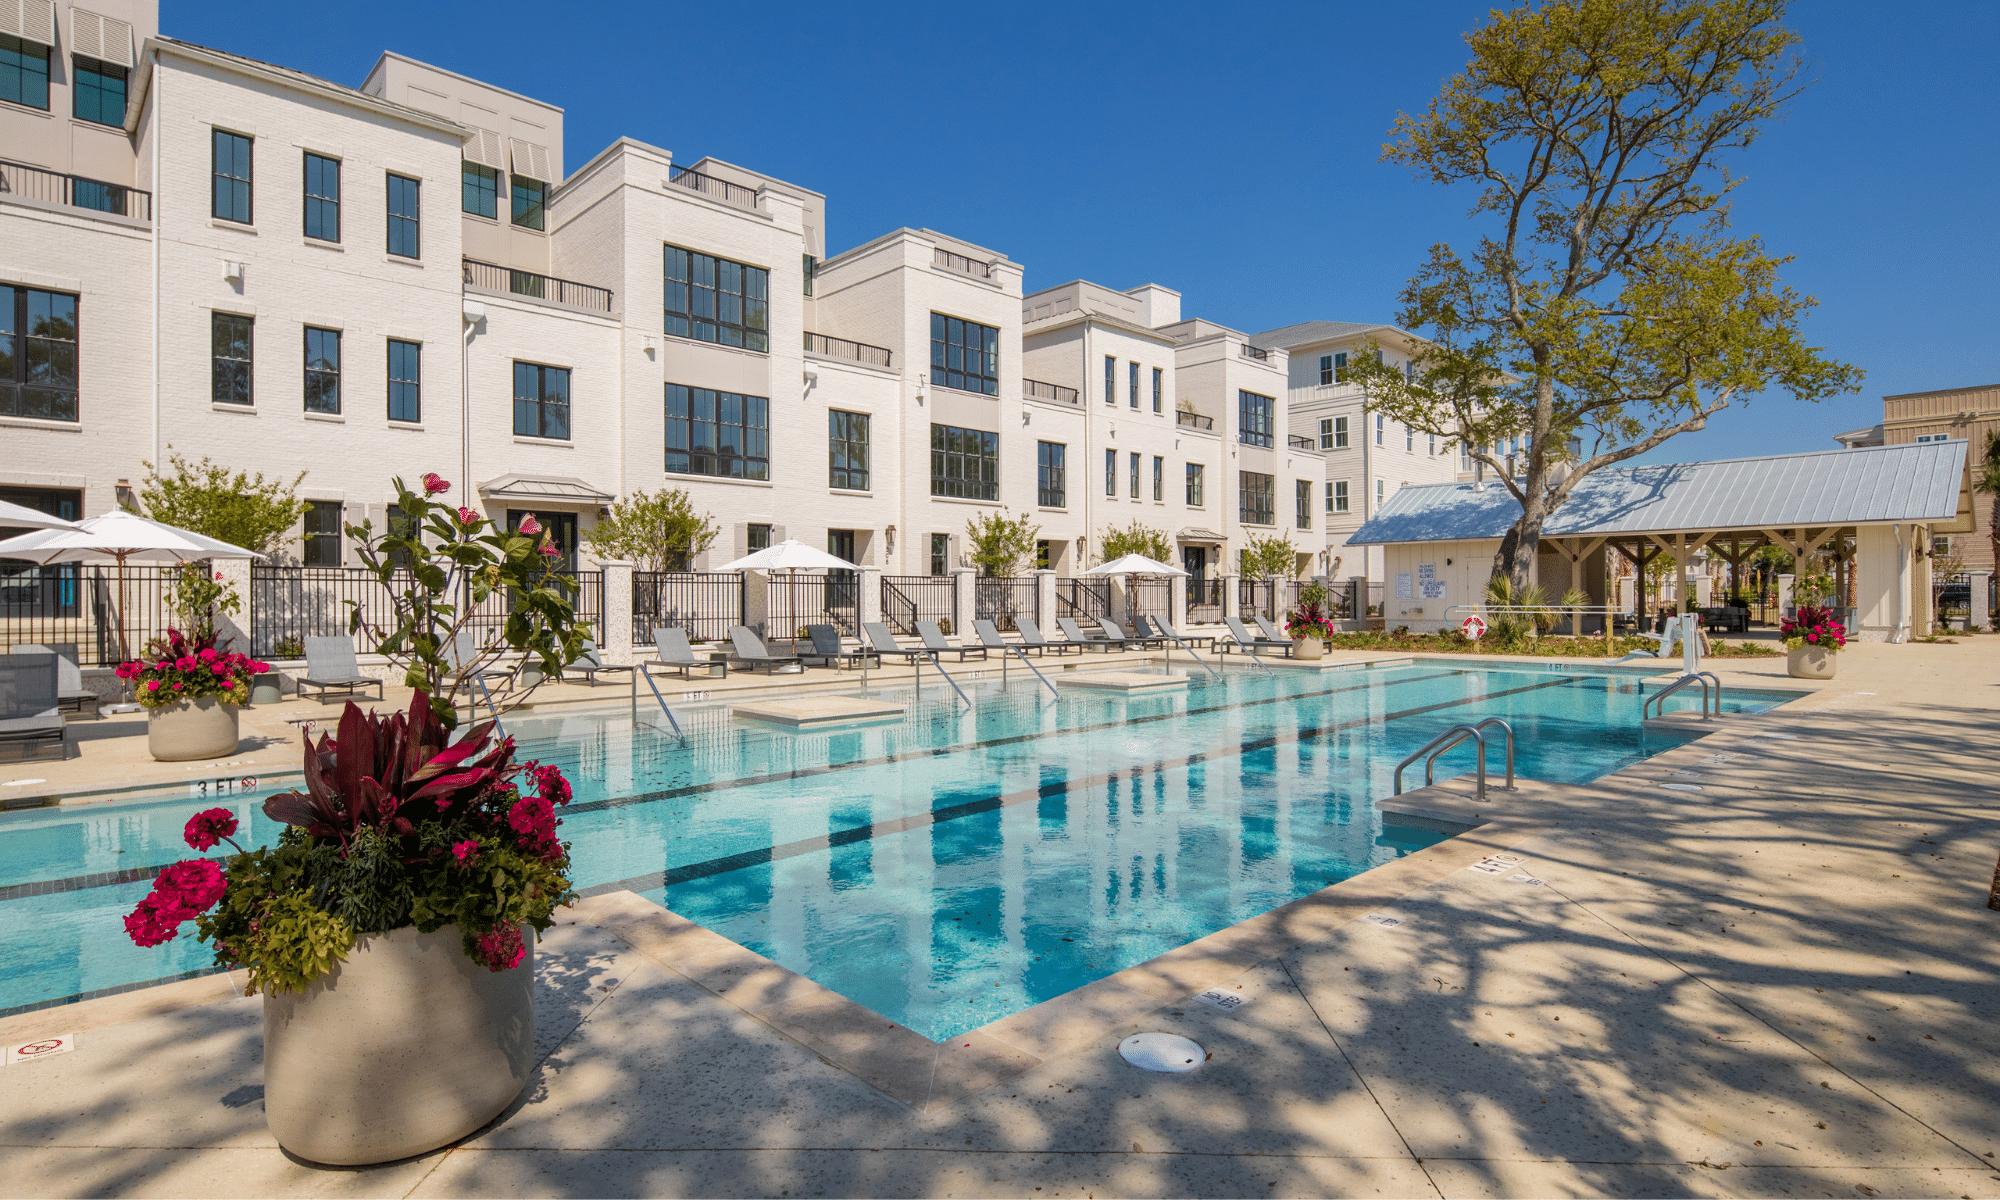 waterfront daniel island condominium overlooking community swimming pool